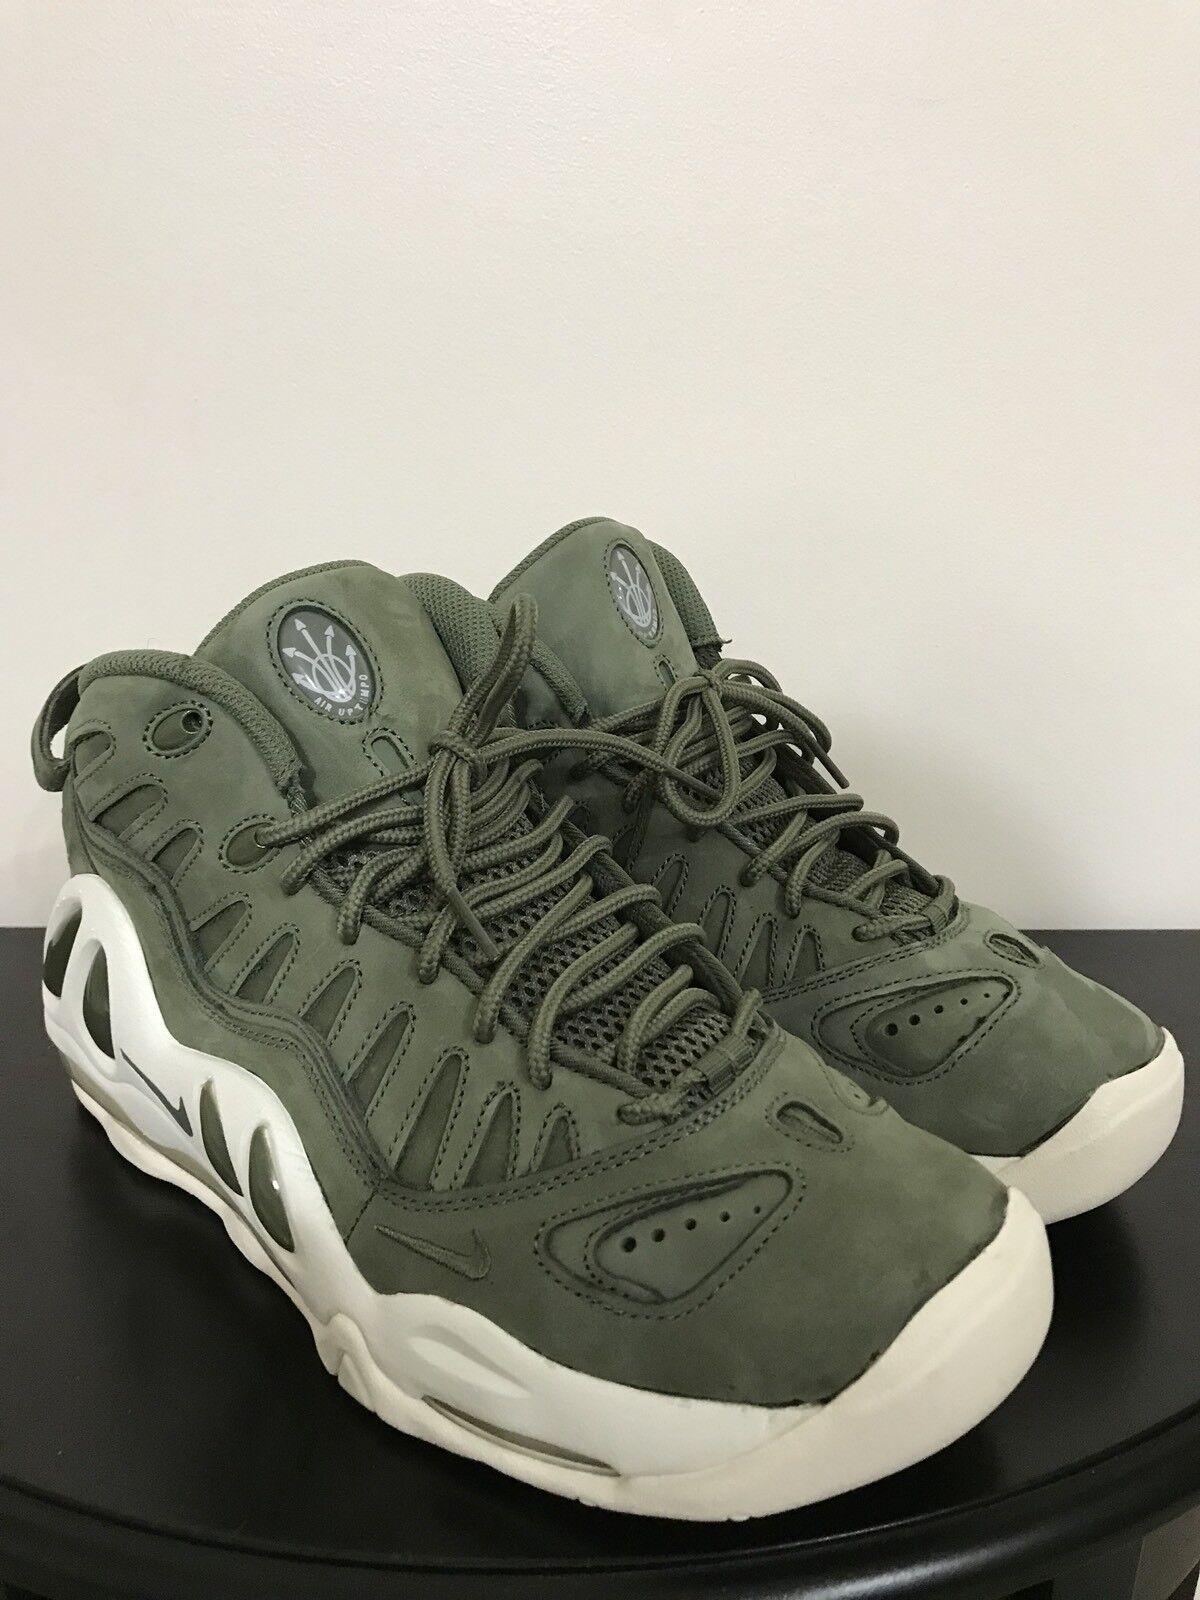 Nike Air Max Uptempo 97 OG Urban Haze White Scottie Pippen (399207-300) Size 10